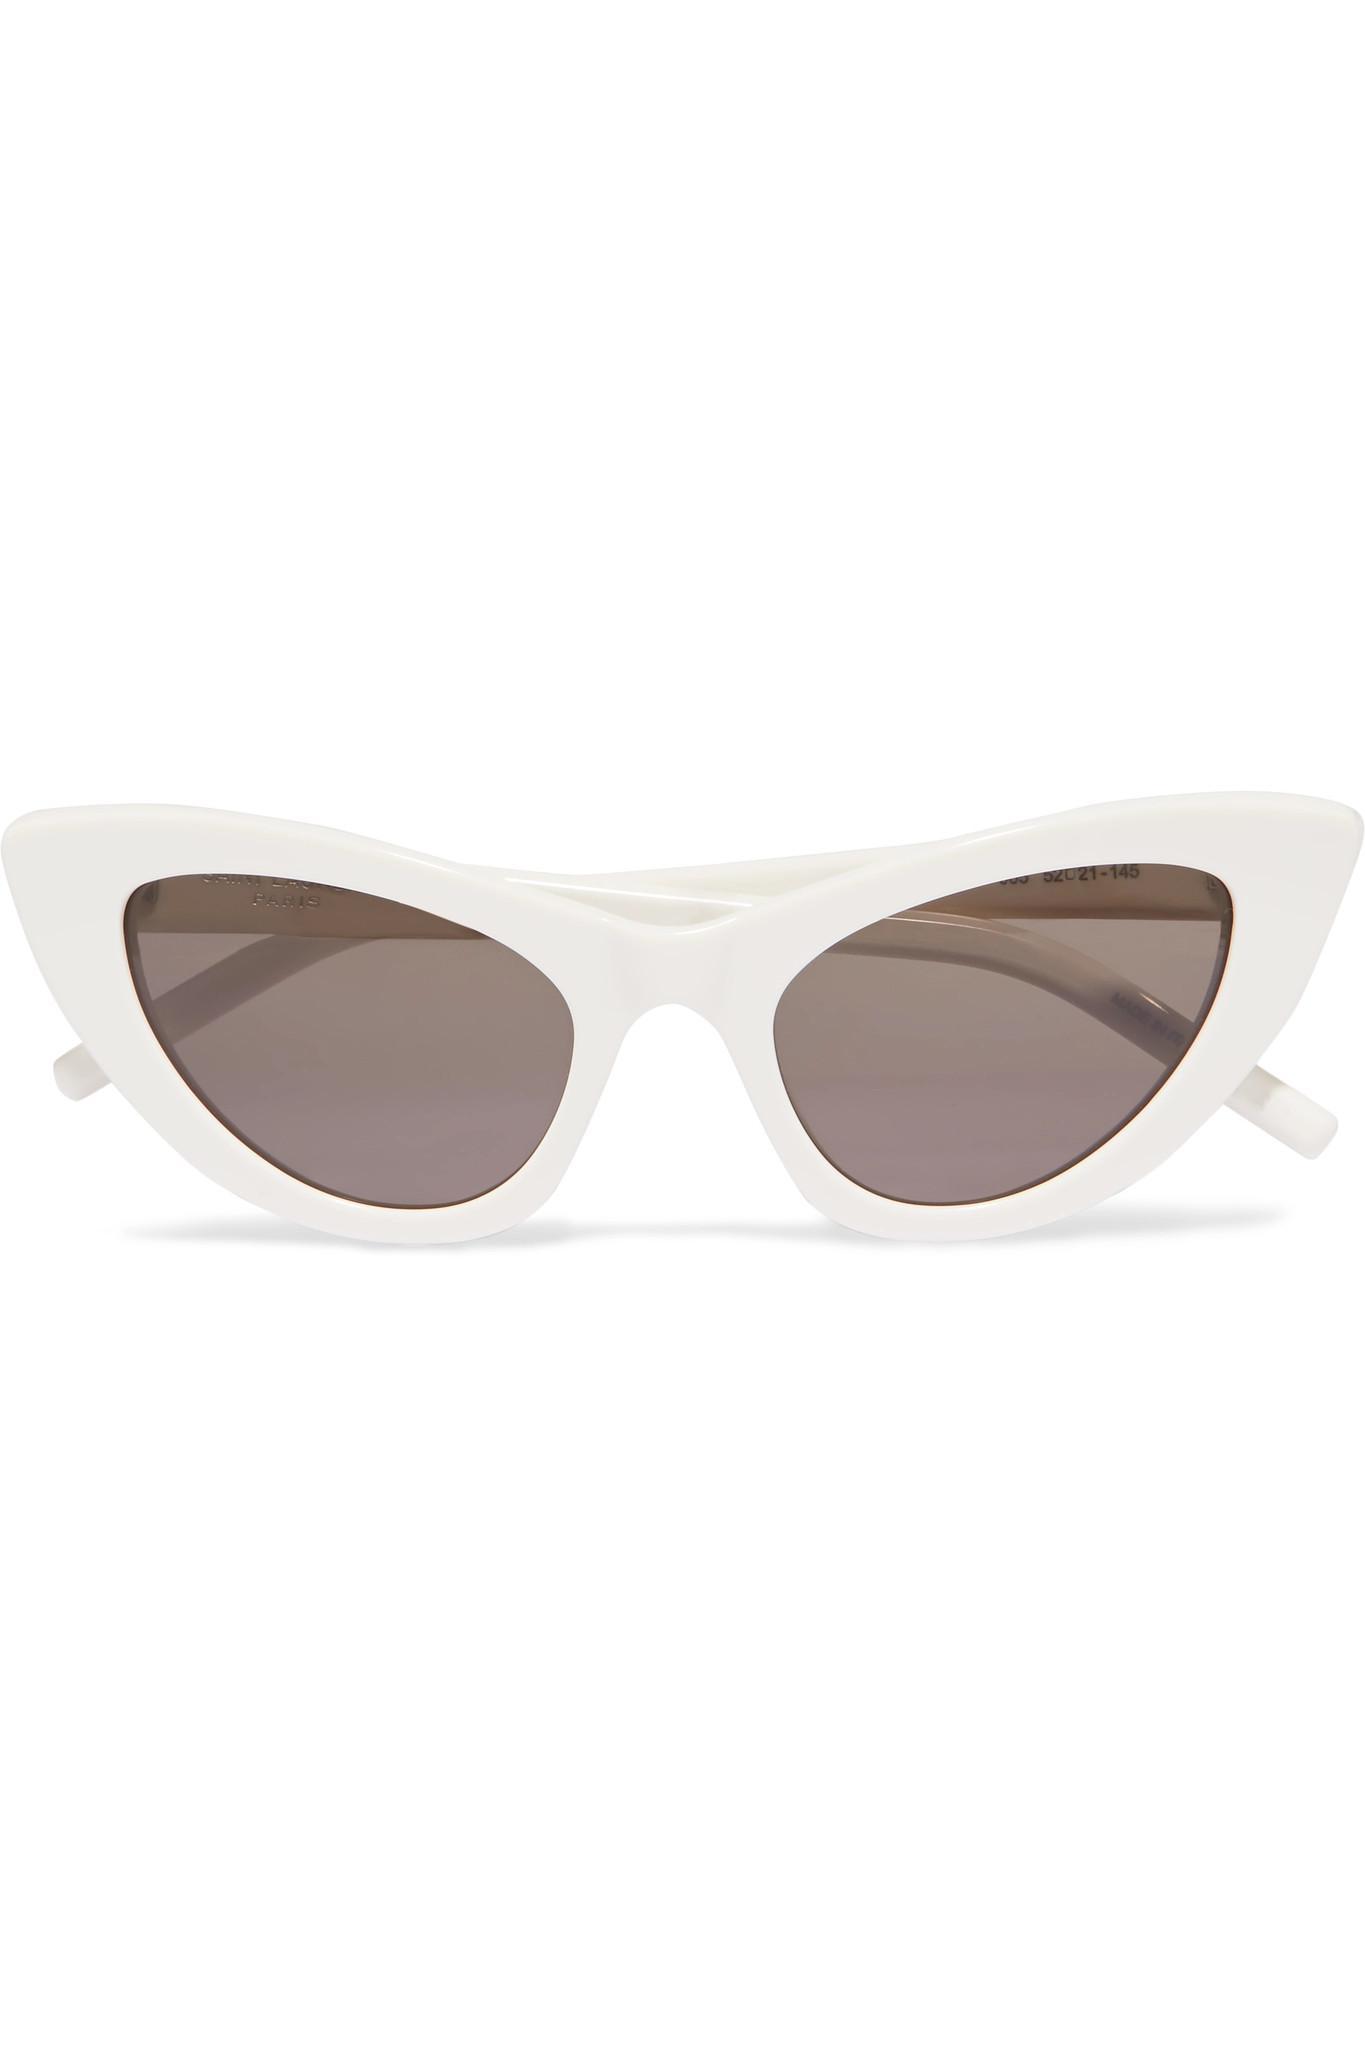 Saint Laurent. Women's White New Wave Lily Cat-eye Acetate Sunglasses